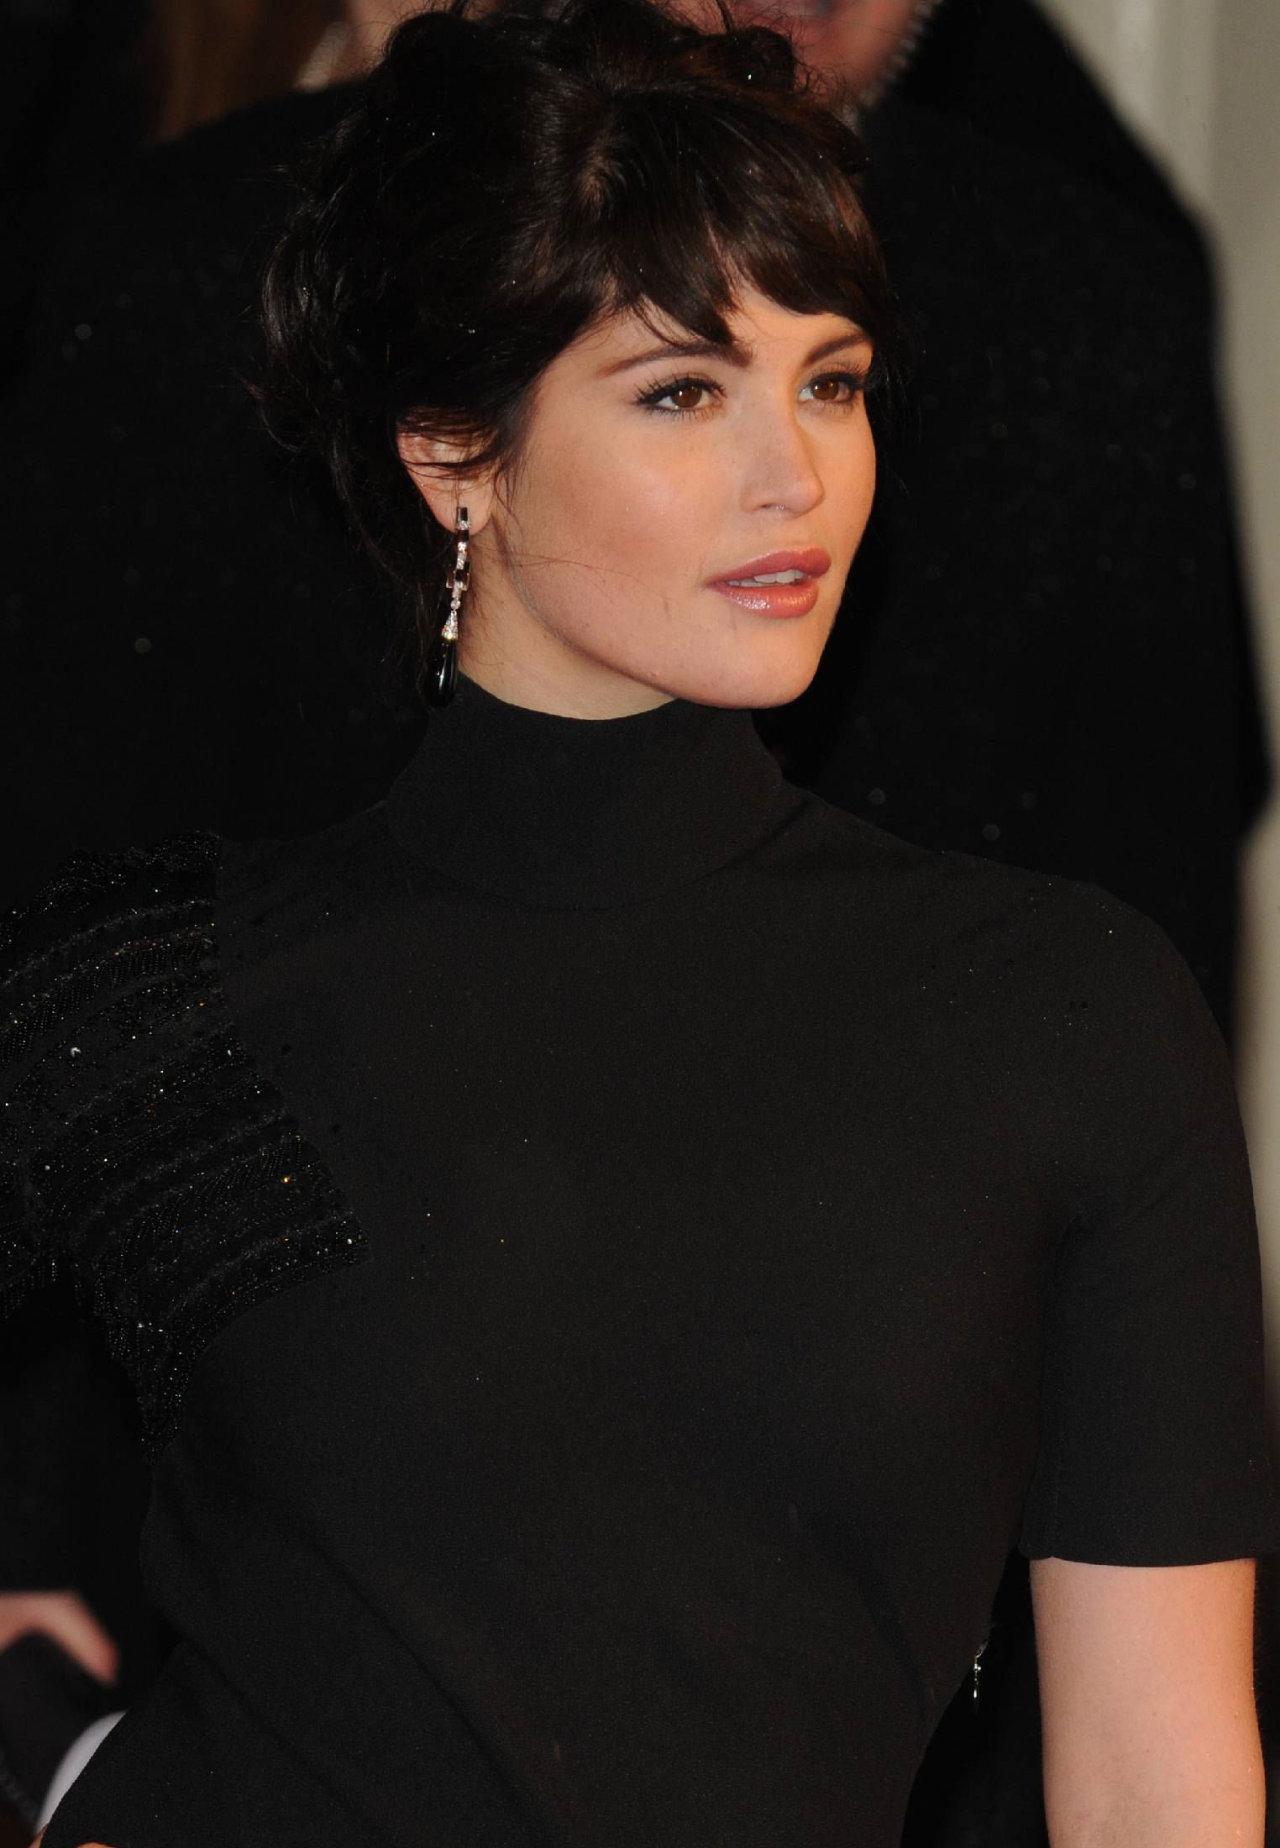 General photo of Gemma Arterton